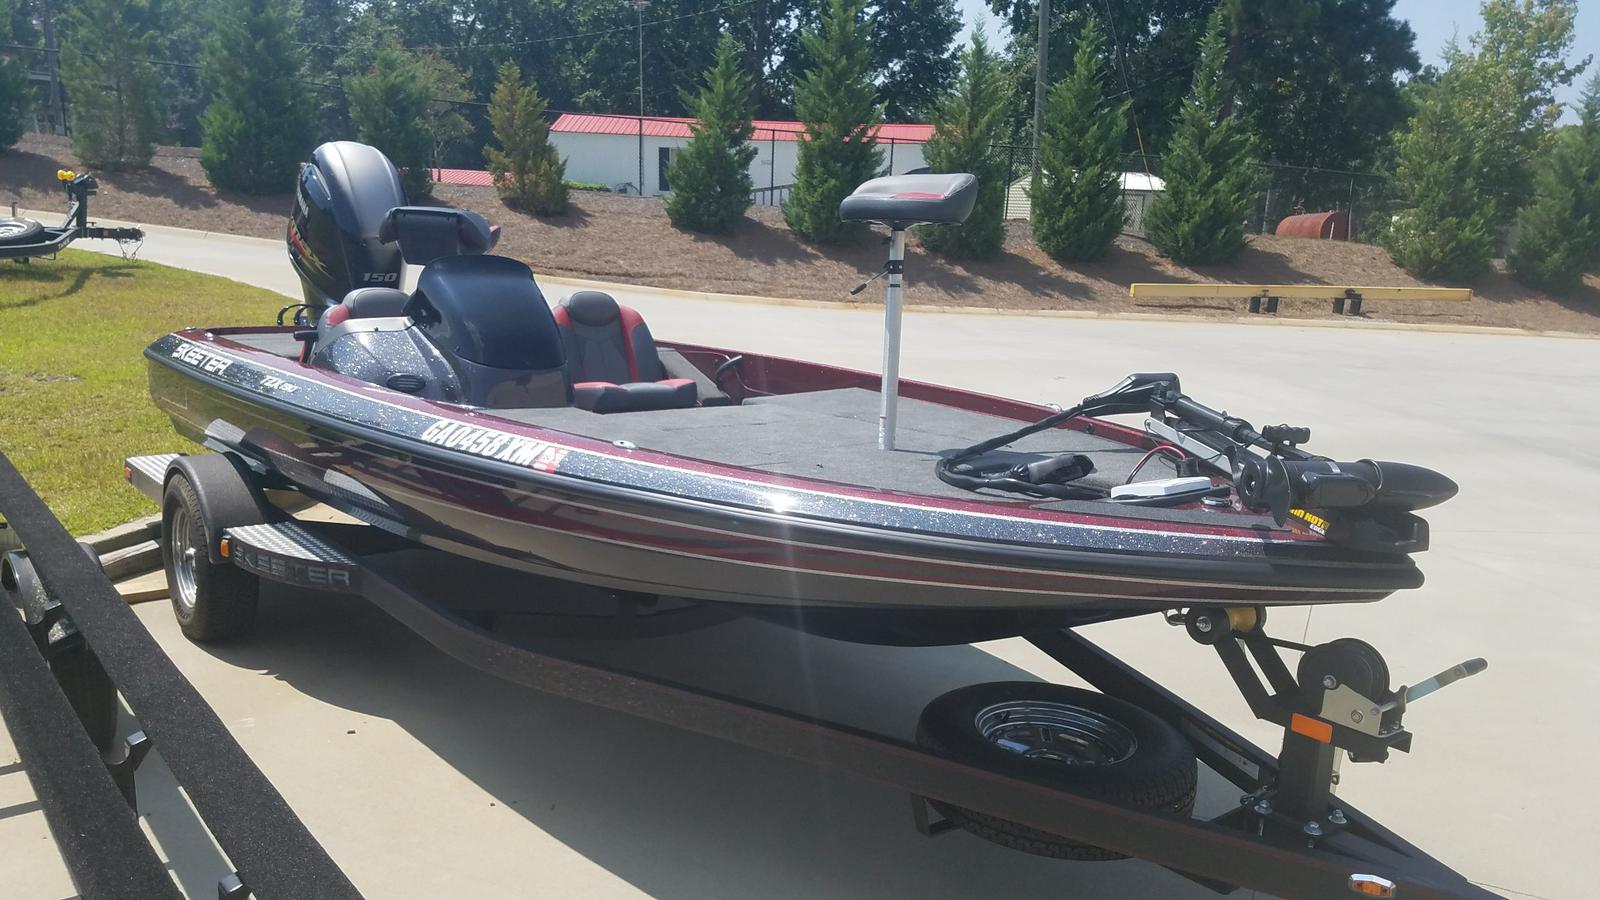 skeeter bass boat for sale - HD1600×900